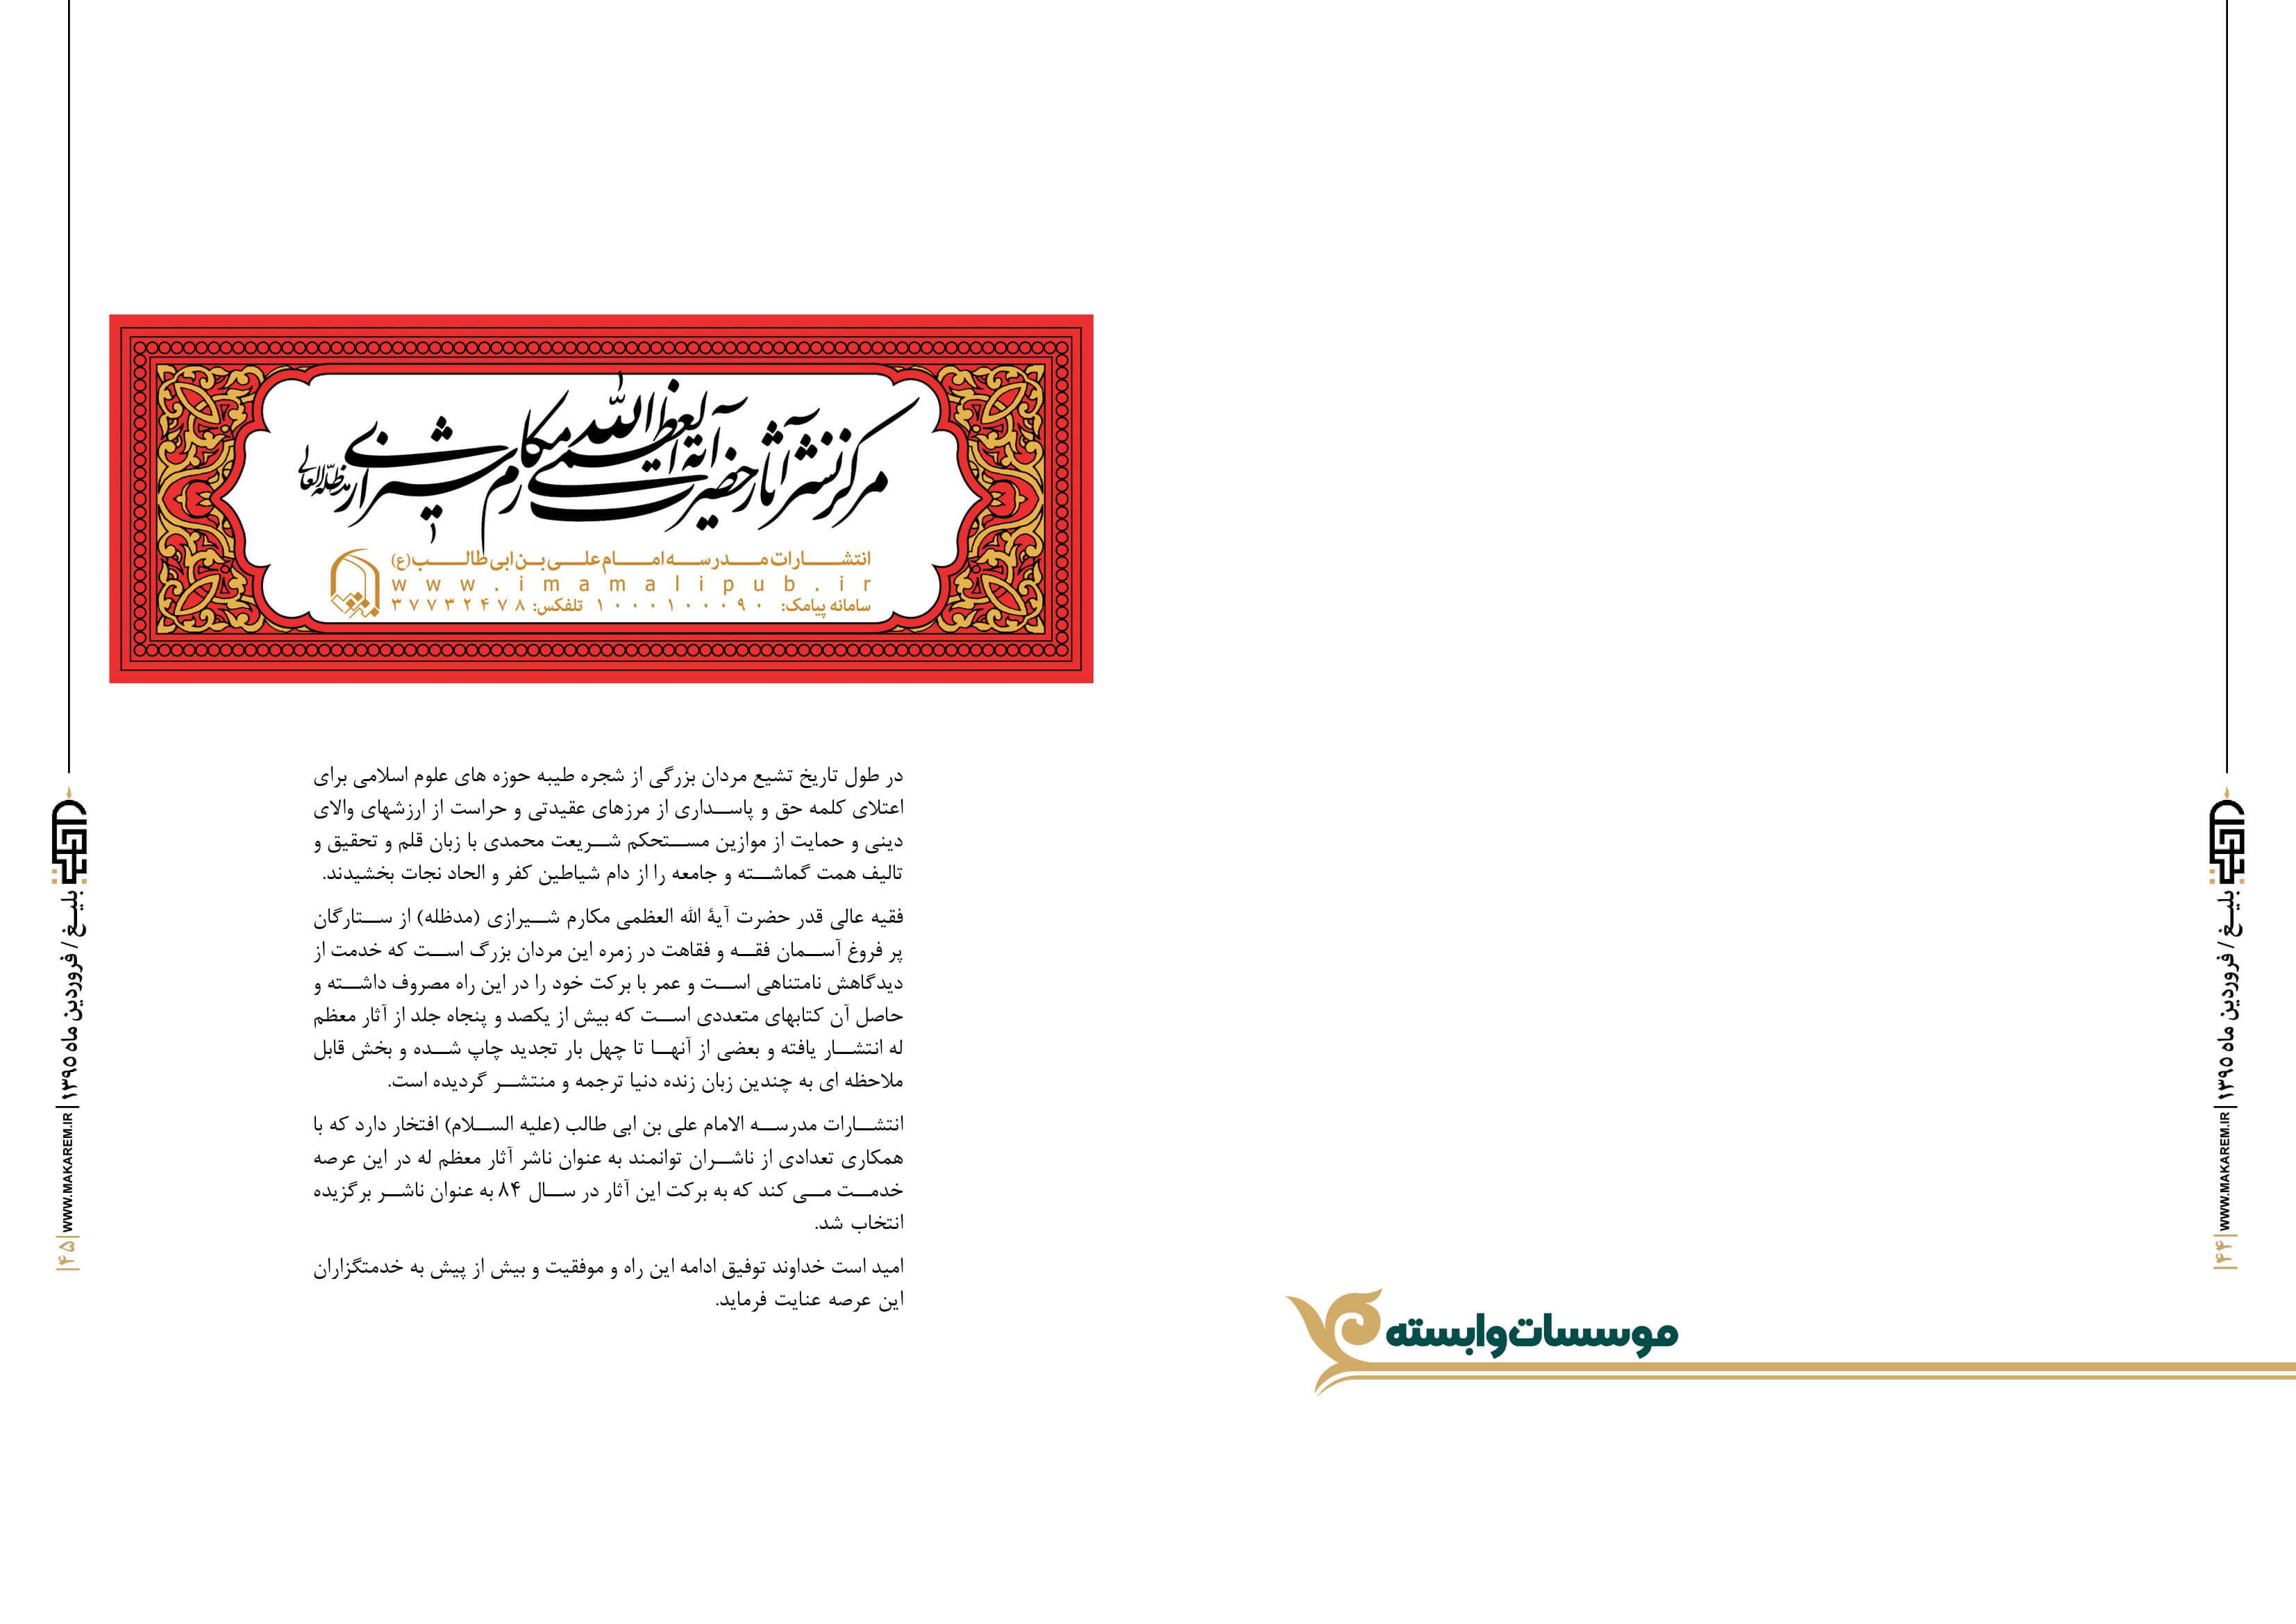 بلیغ 23-مدرسه الامام امیر المومنین (ع)